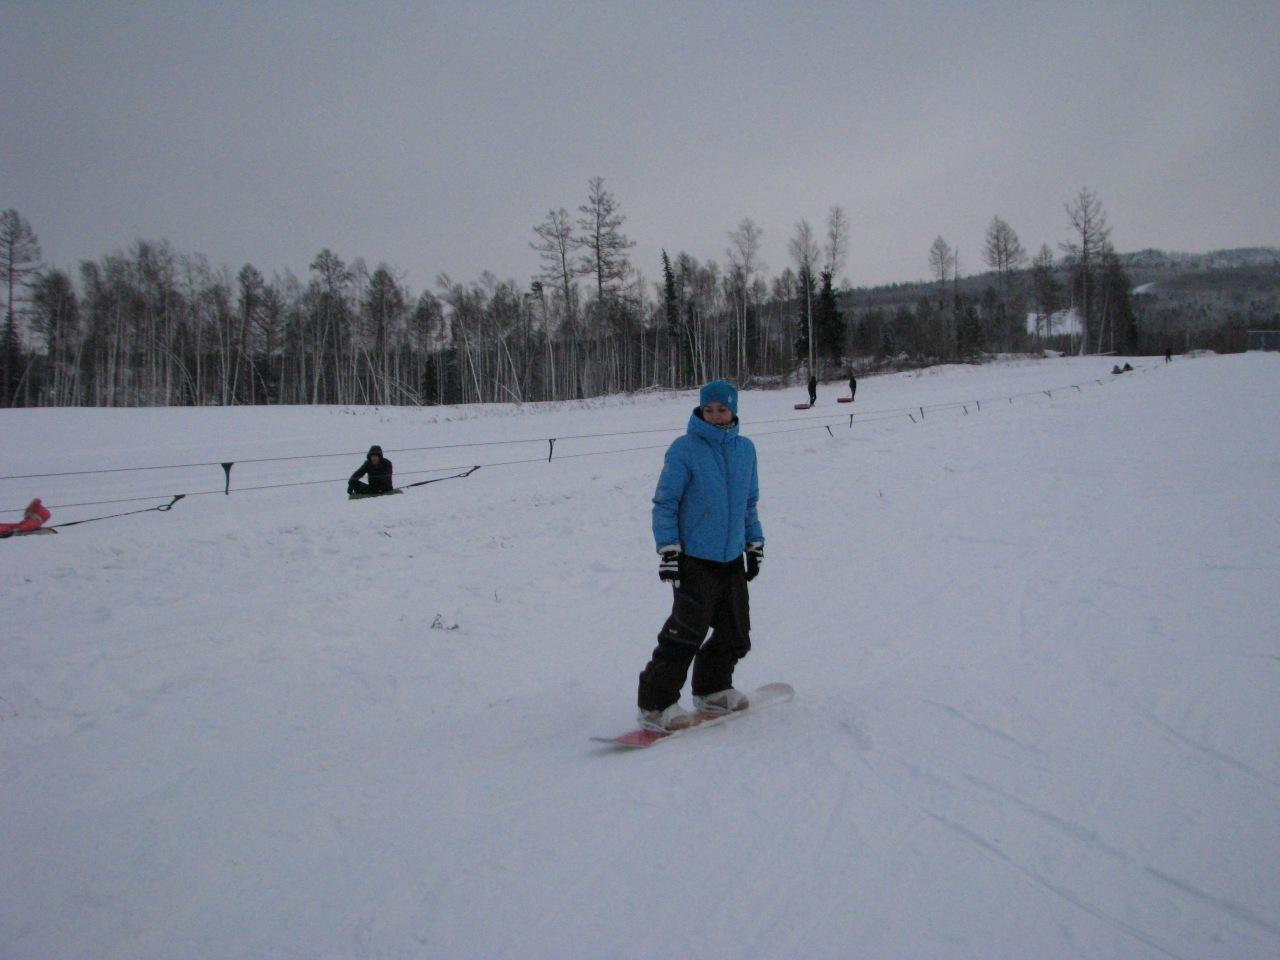 сноуборд, орехов камень